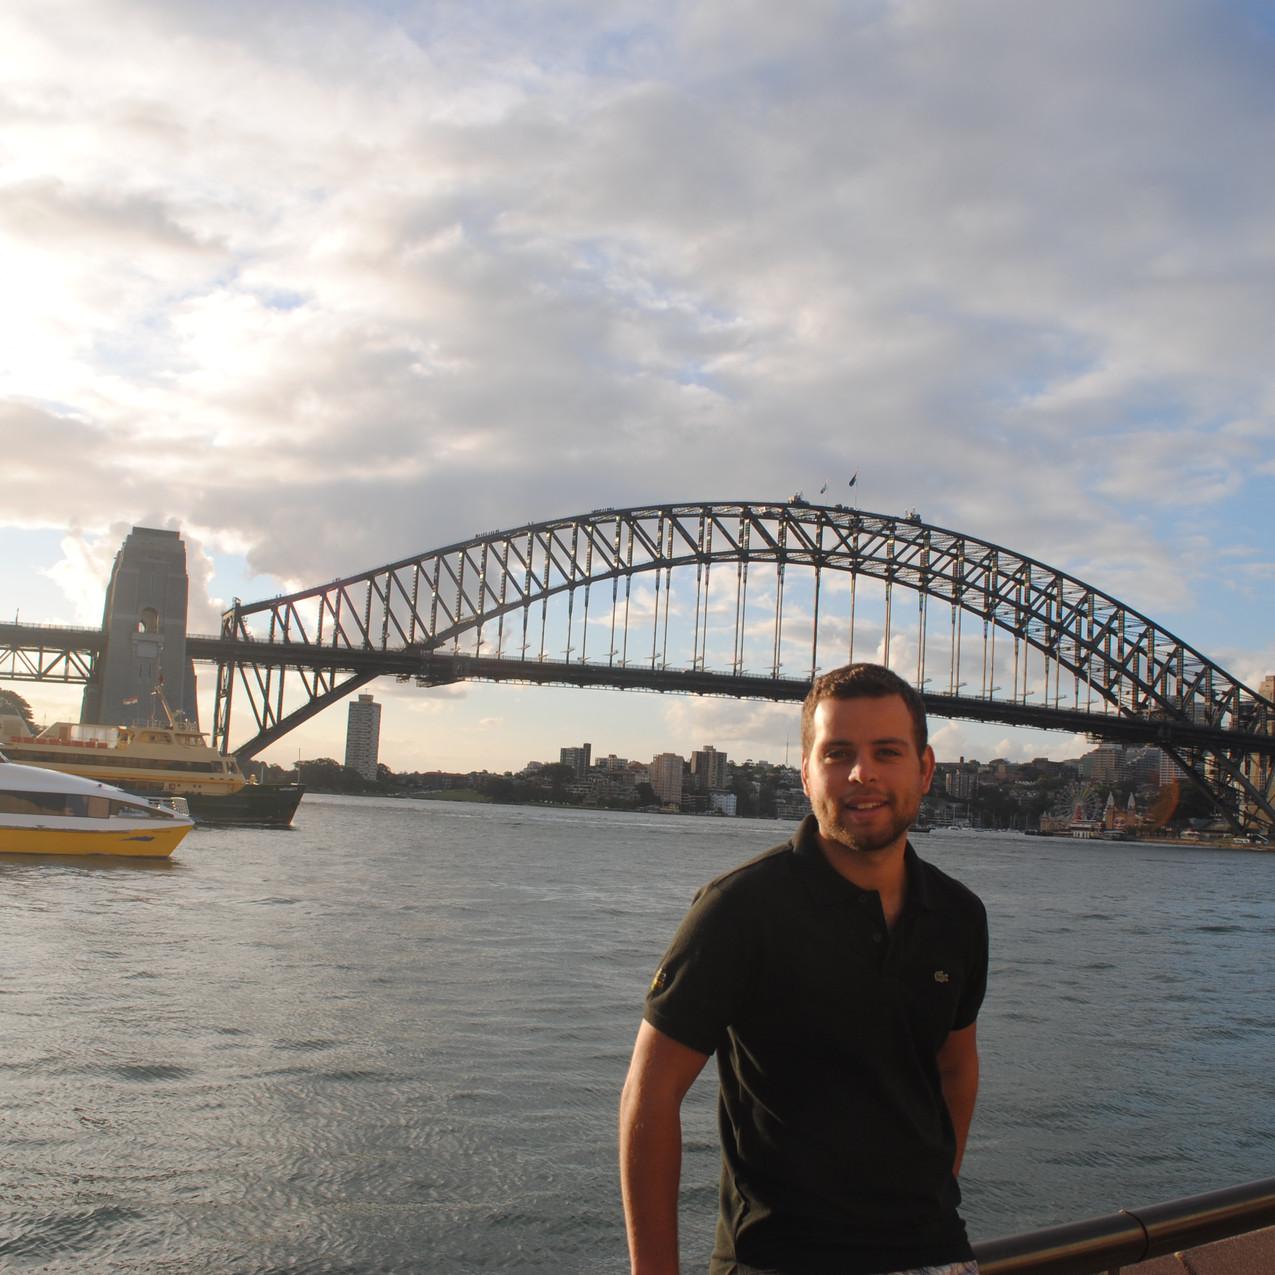 Opera House and Harbour Bridge